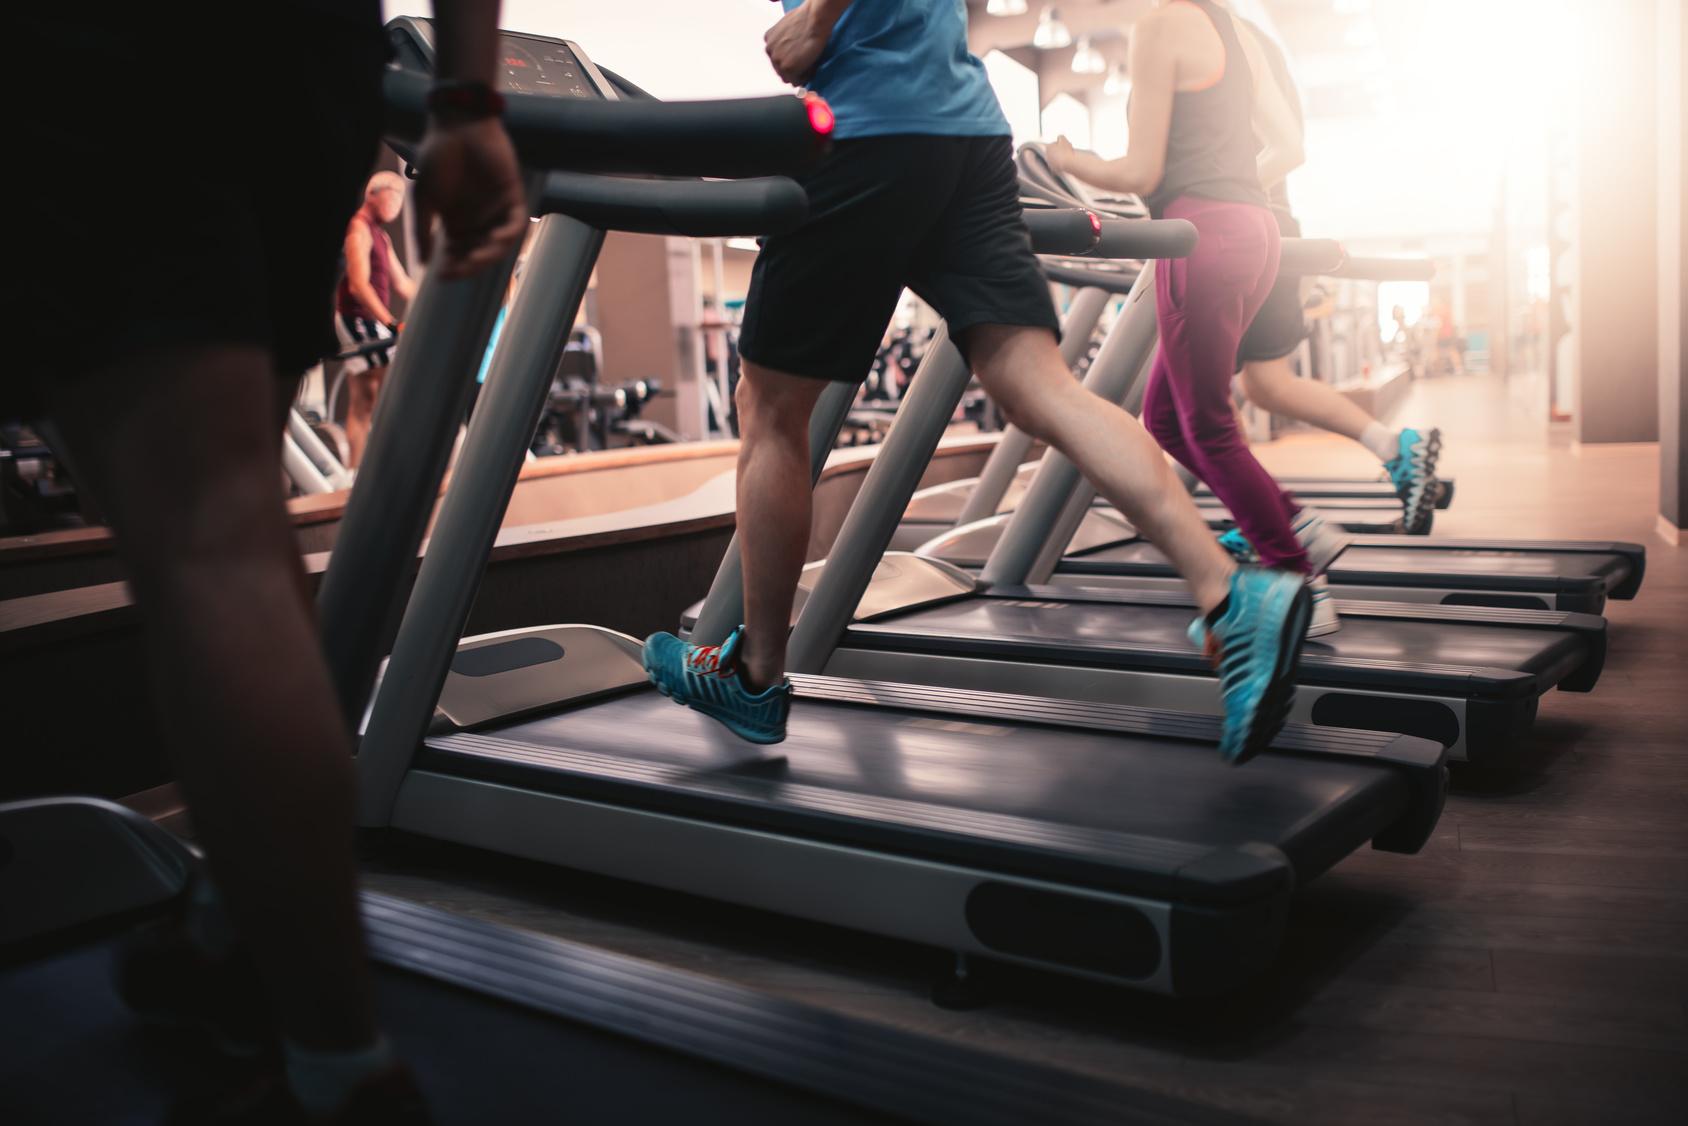 Fotolia_108992094_People running in machine treadmill _M